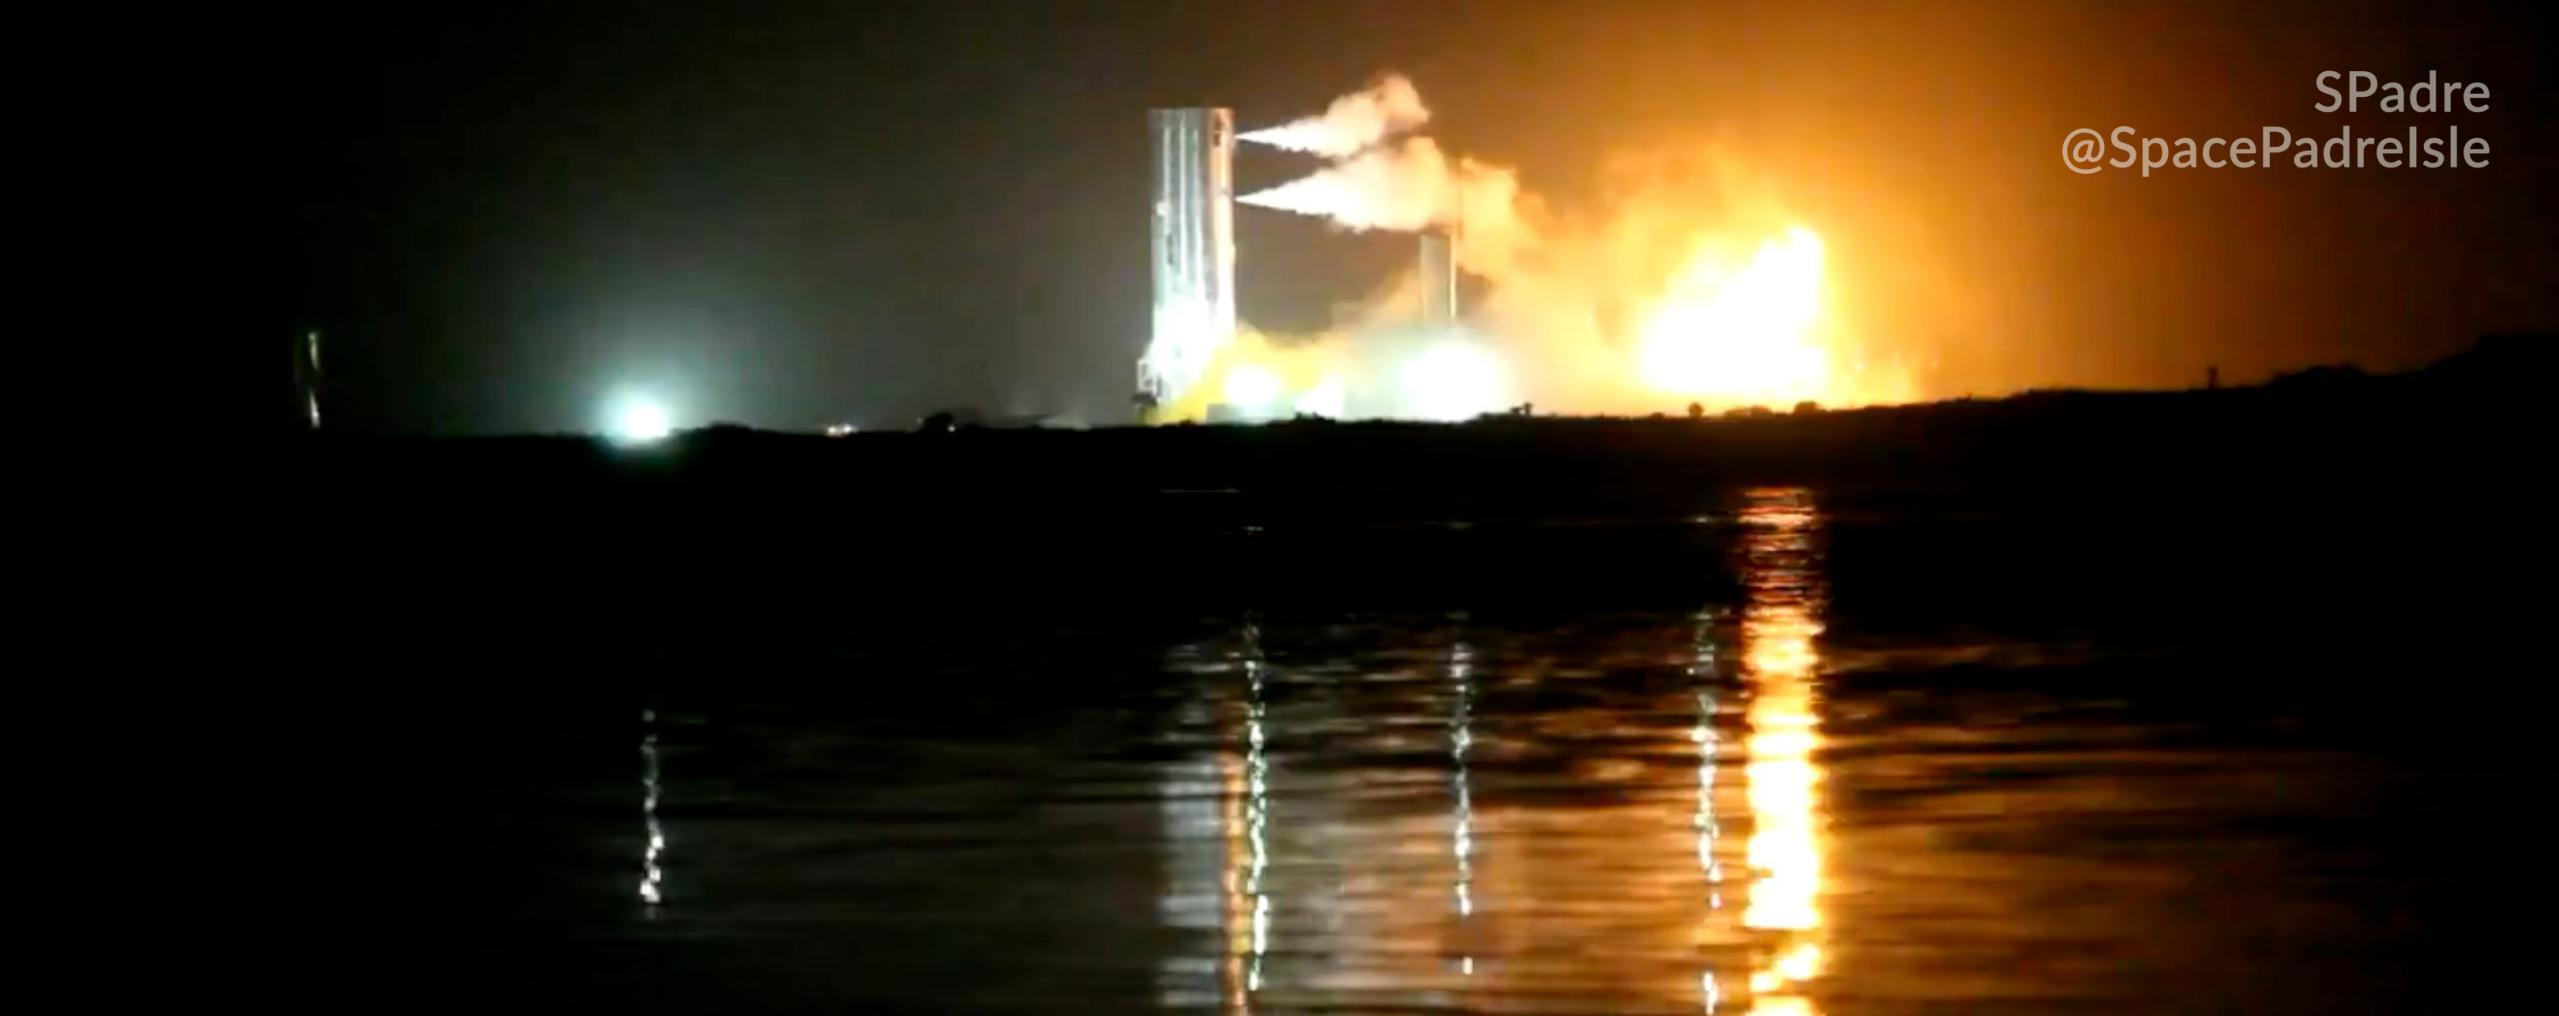 Starship Boca Chica 050520 (SPadre) SN4 static fire attempt 1 (c)